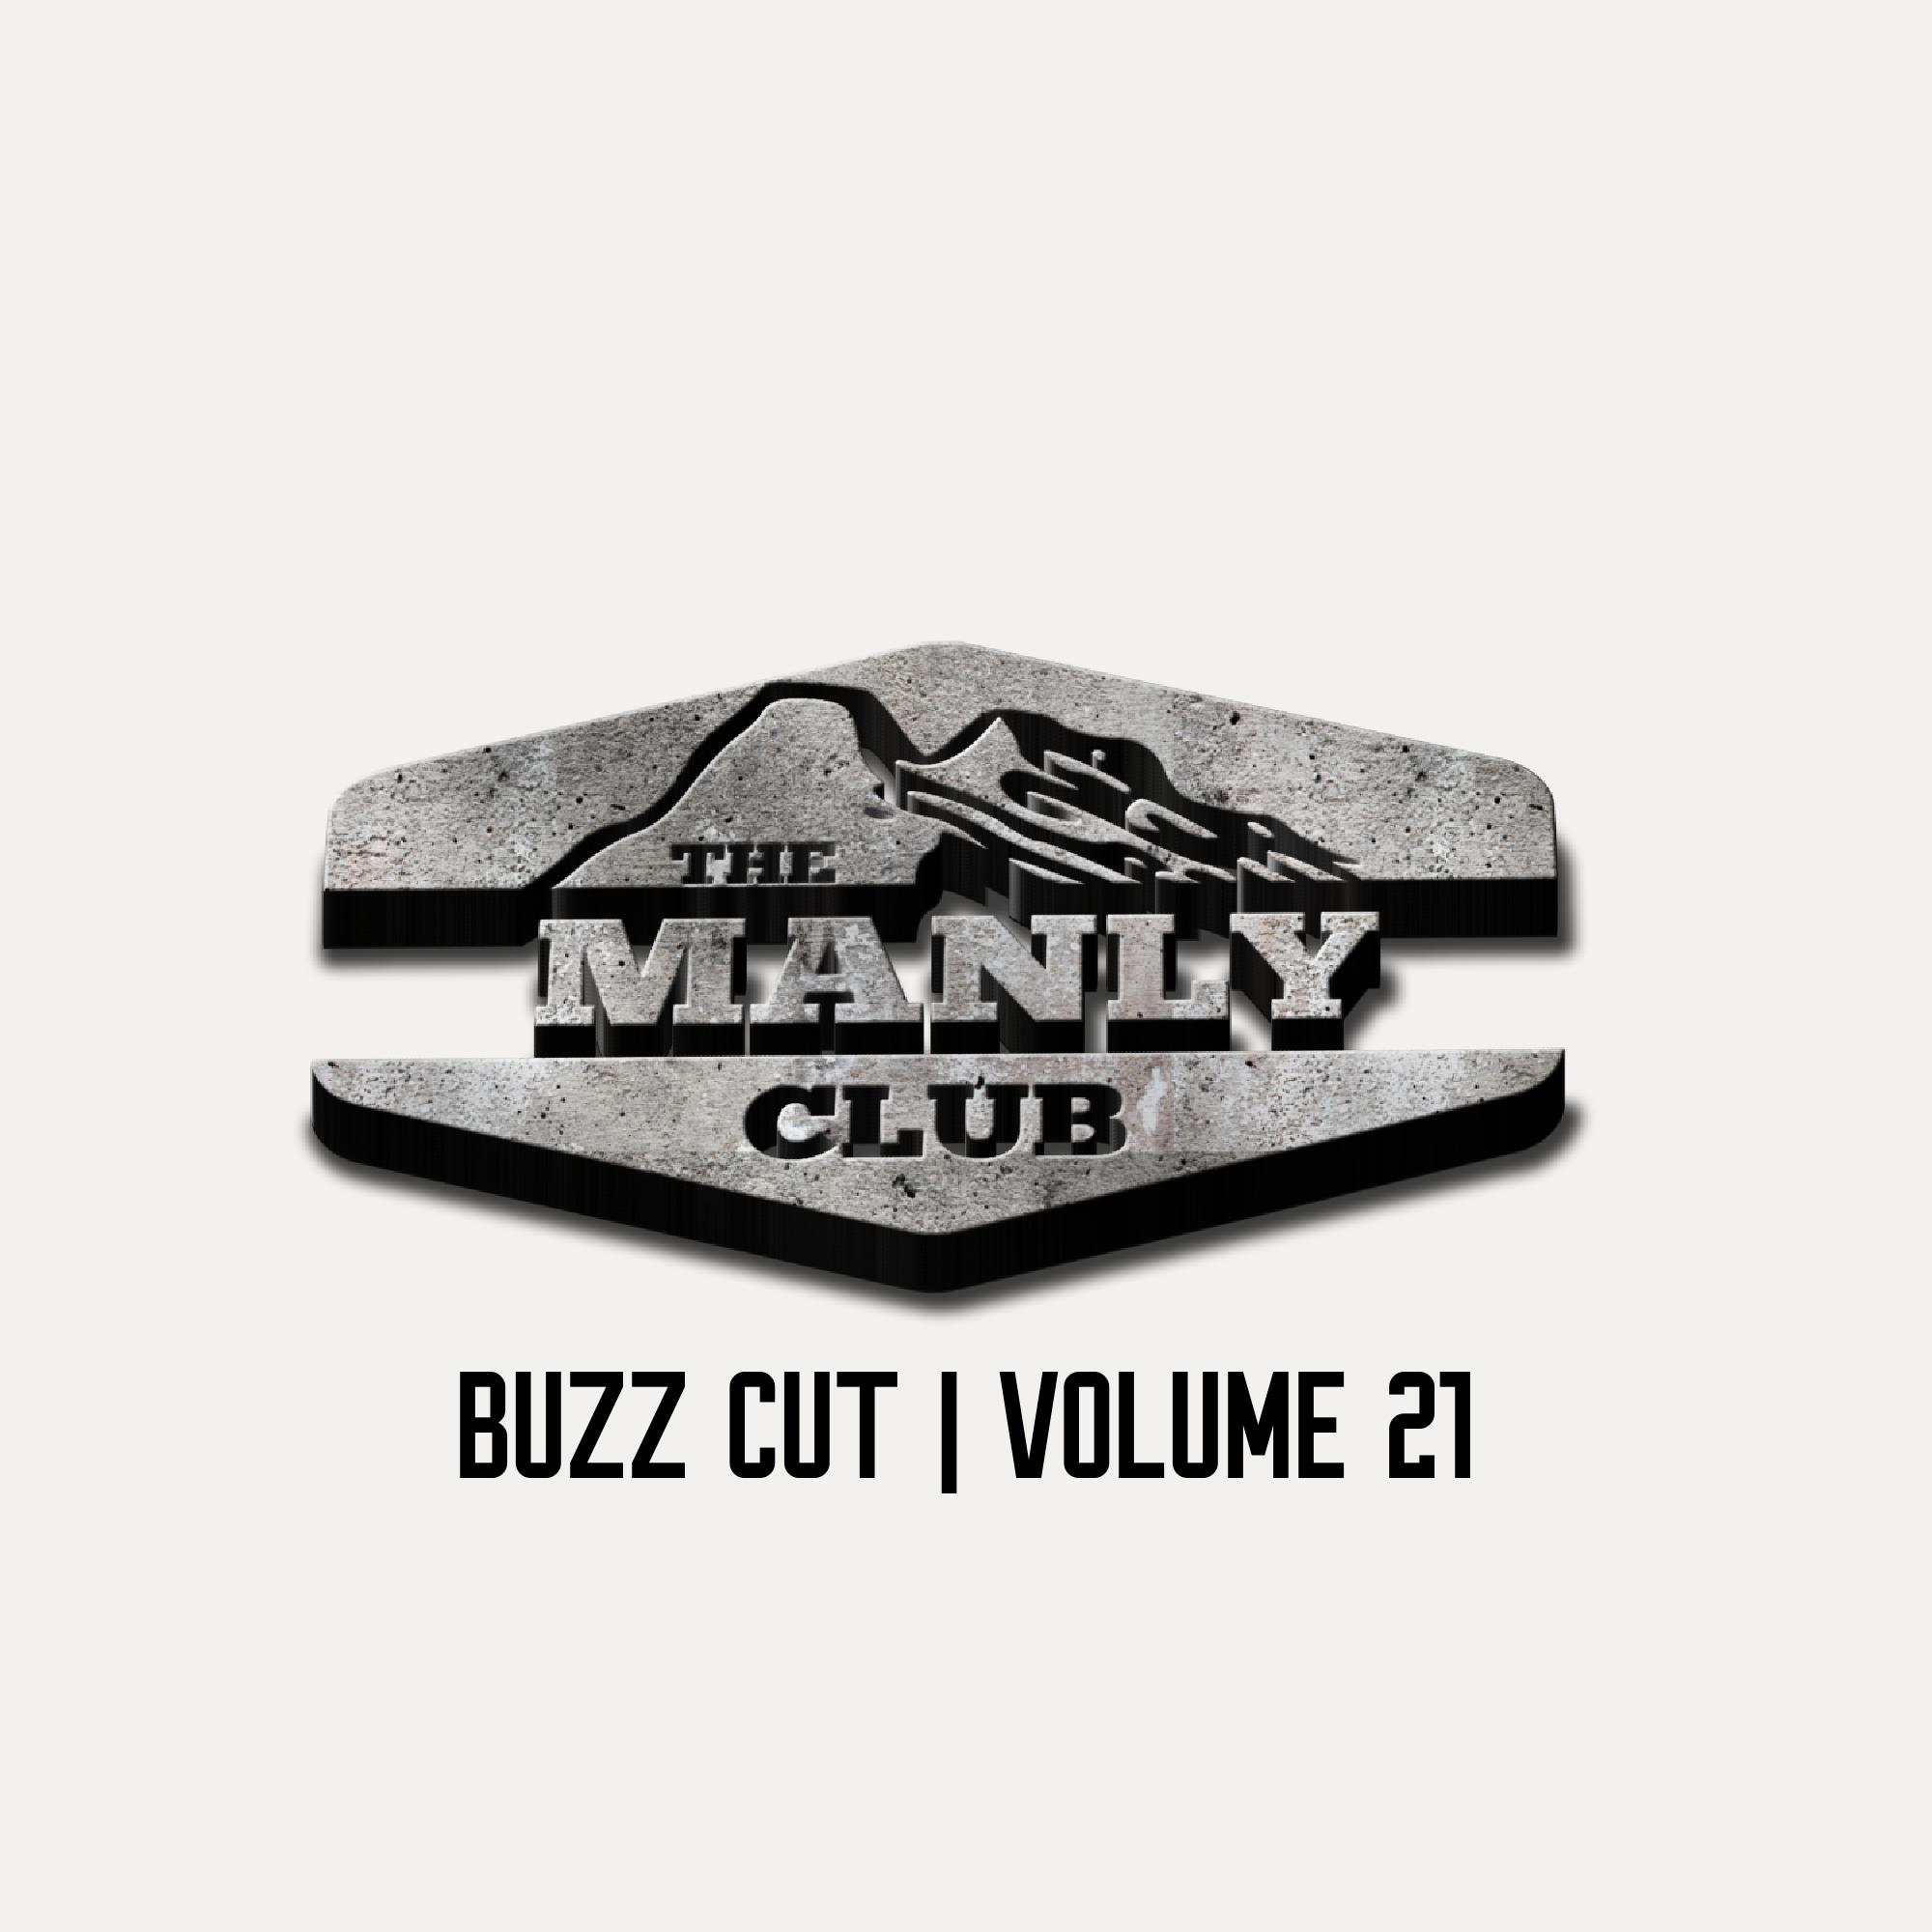 the manly club buzz cut volume 21